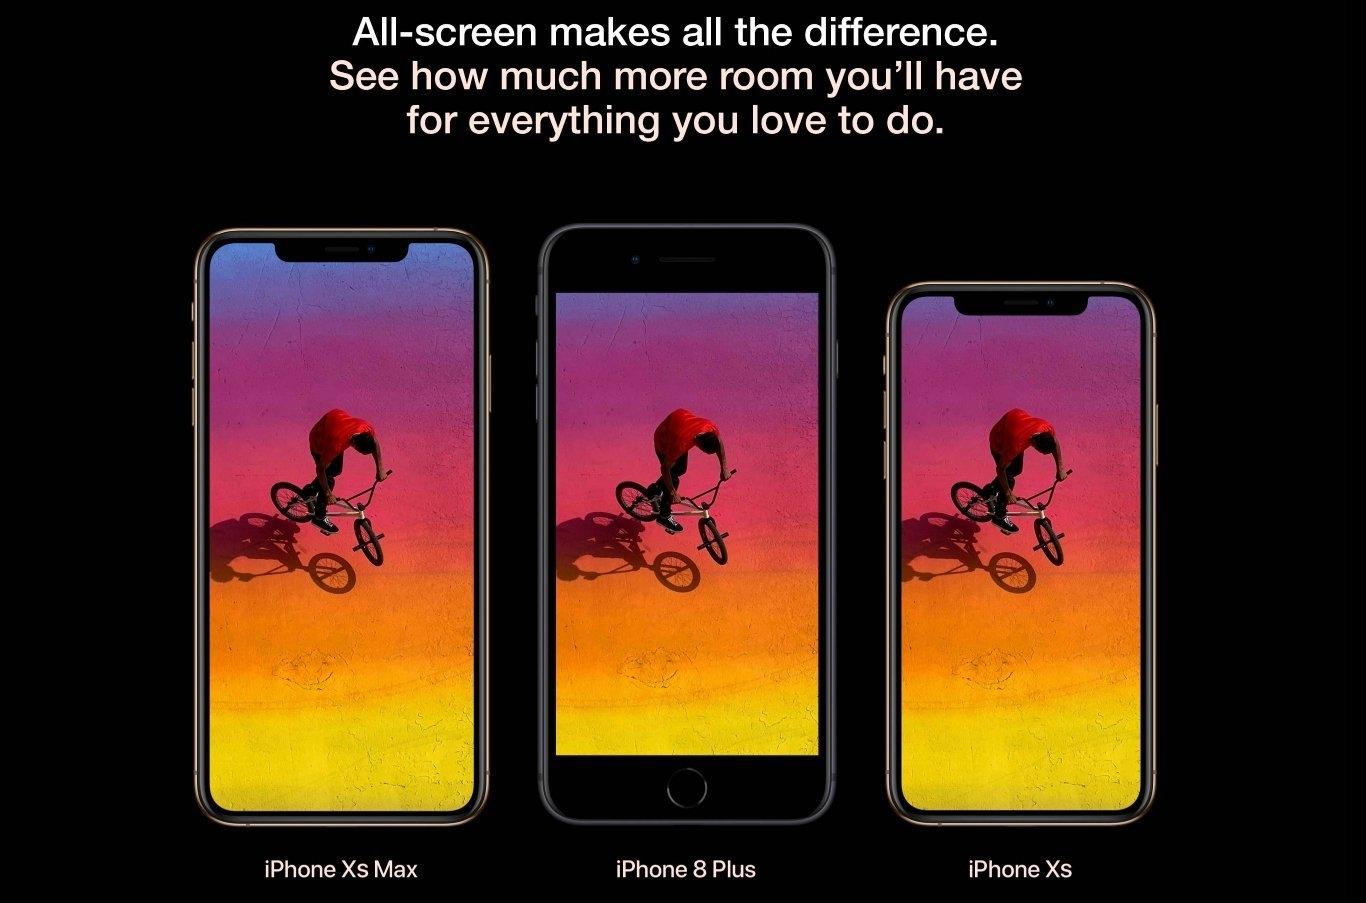 iphone xs max 256gb Apple IPhone XS Max 256GB – Dual SIM (nano-SIM) 04ea121b2998a453b6cbefe95a42c13f